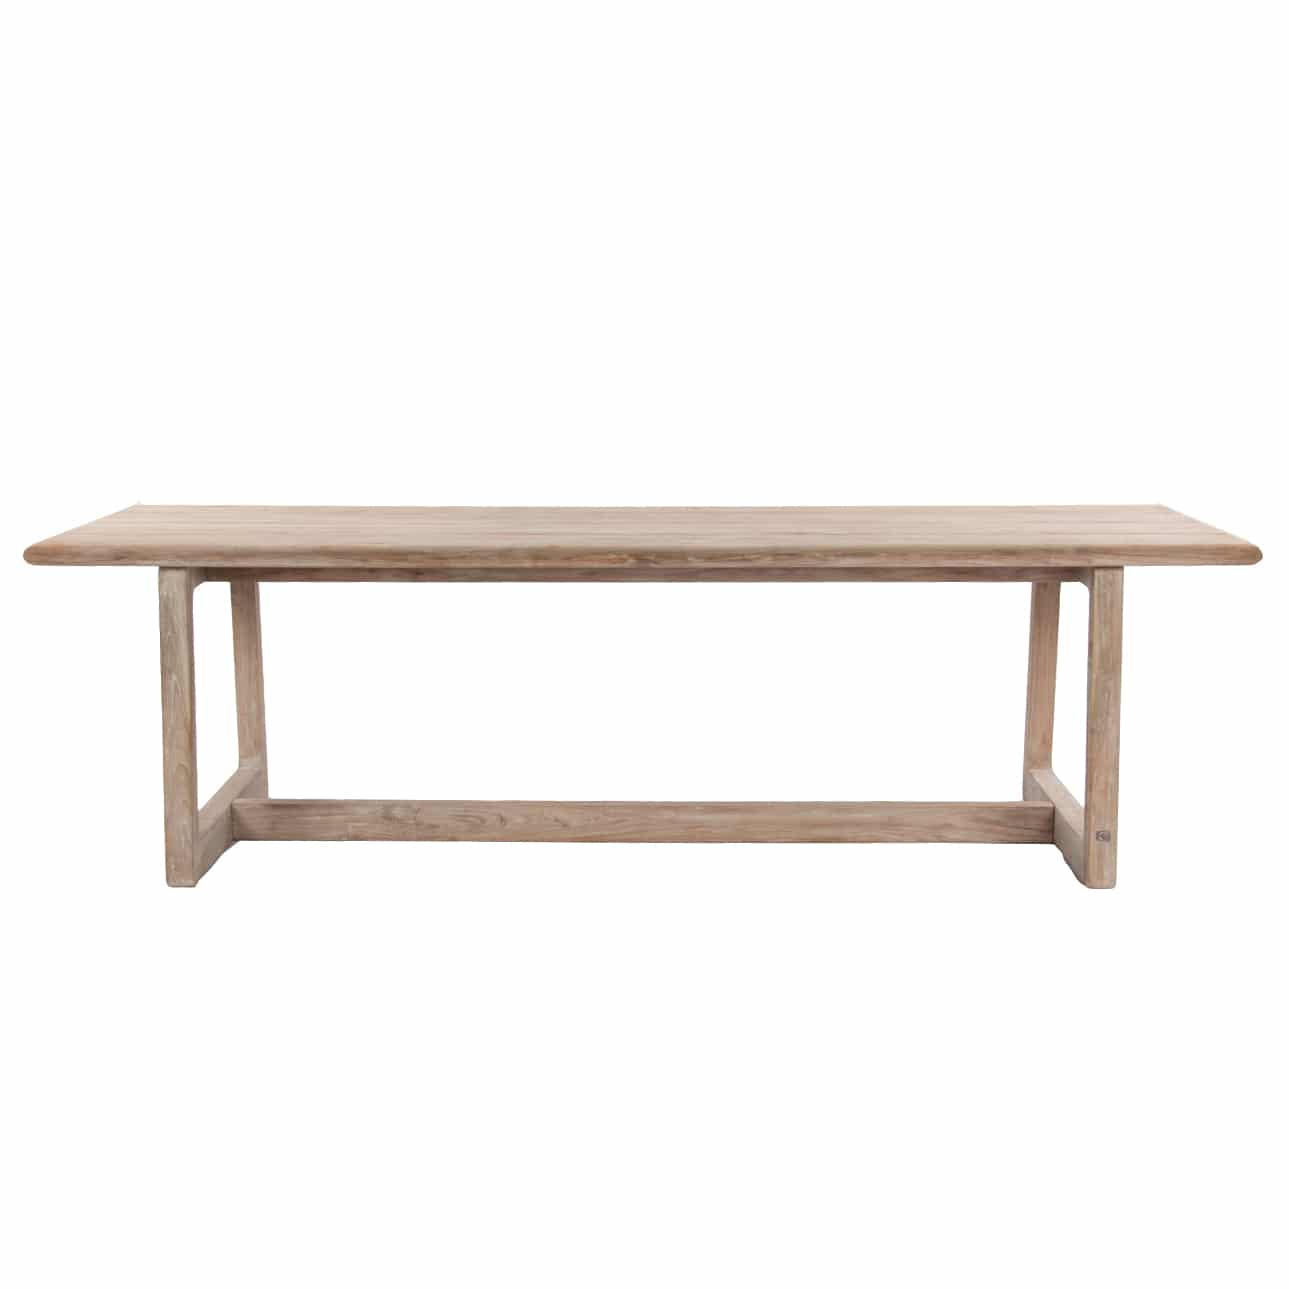 Donald Rectangular Reclaimed Teak Dining Table | Design ...